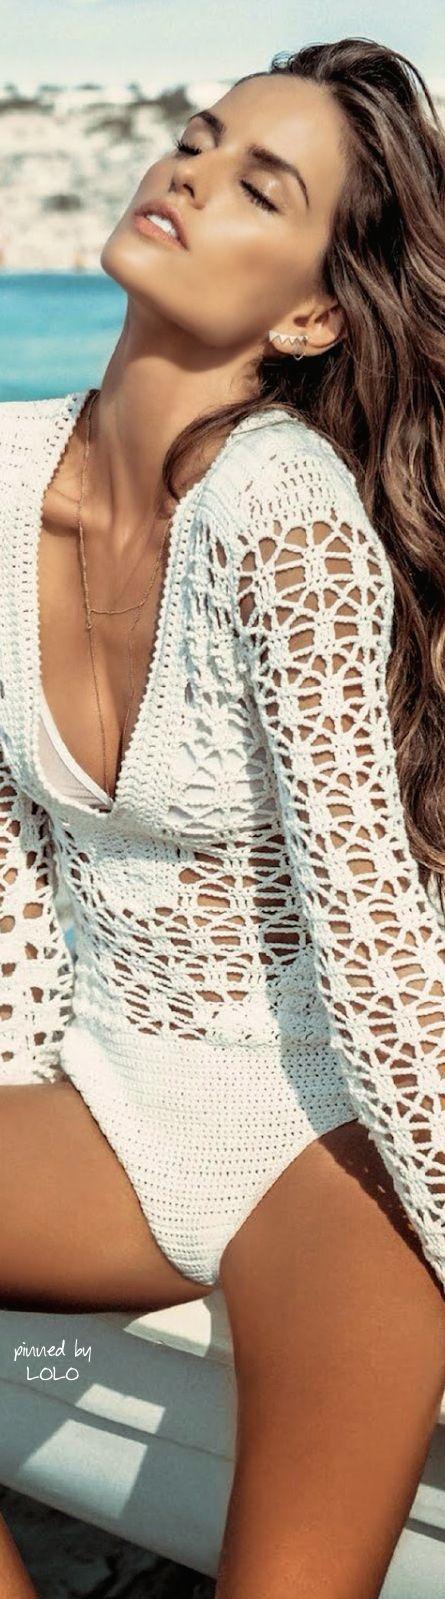 Vestido Branco de Crochet                                                       …